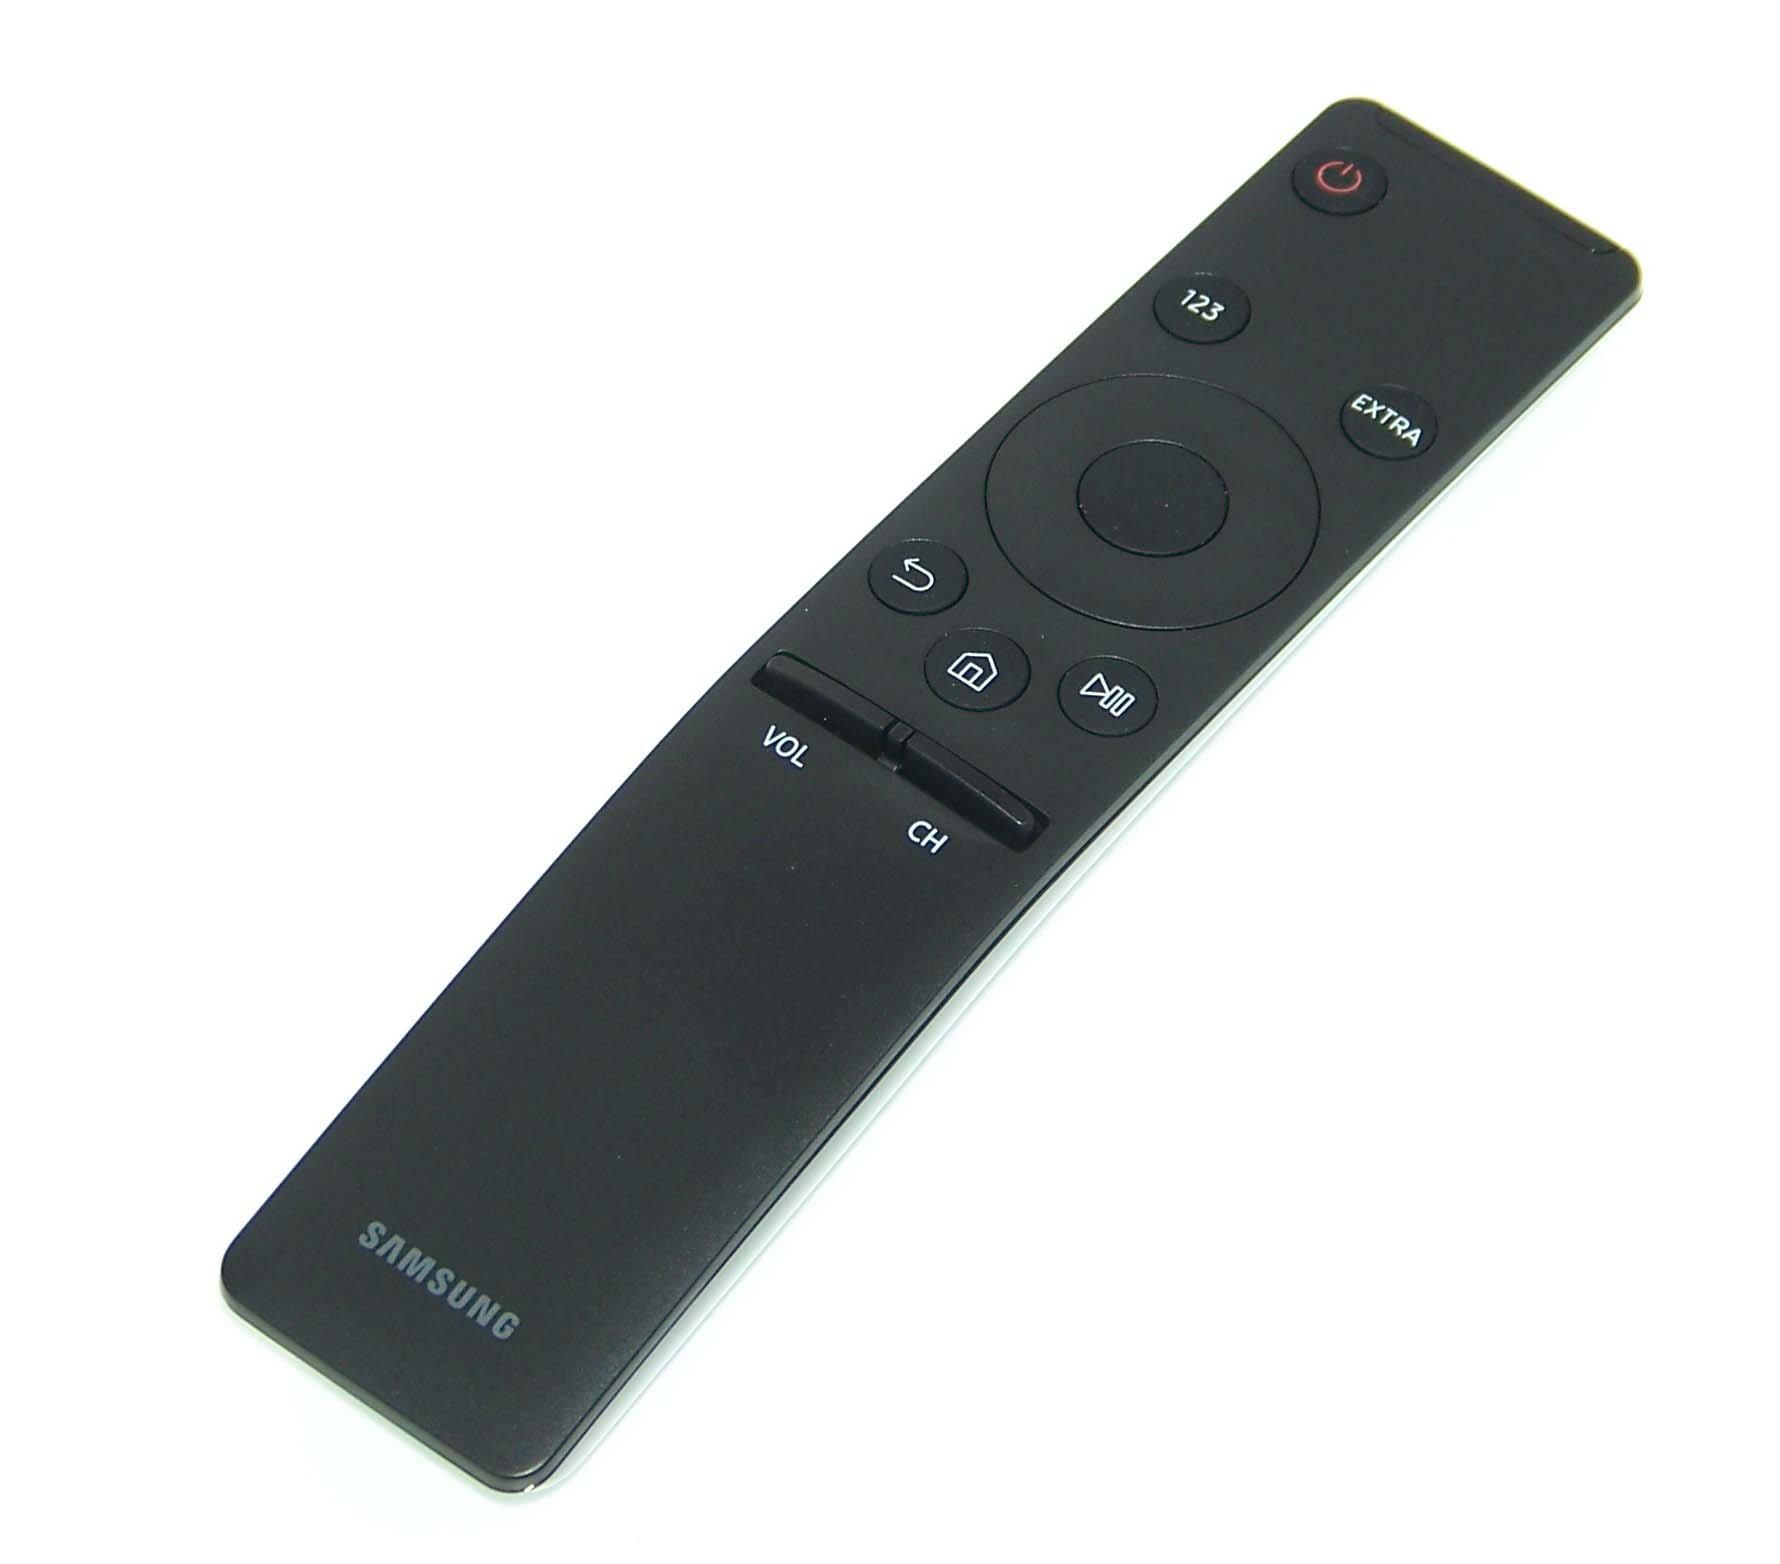 OEM Samsung Remote Control Originally Shipped With Samsung UN55KU6500, UN55KU6500FXZA, UN55KU650D, UN55KU650DFXZA, UN55KU6600, UN55KU6600FXZA